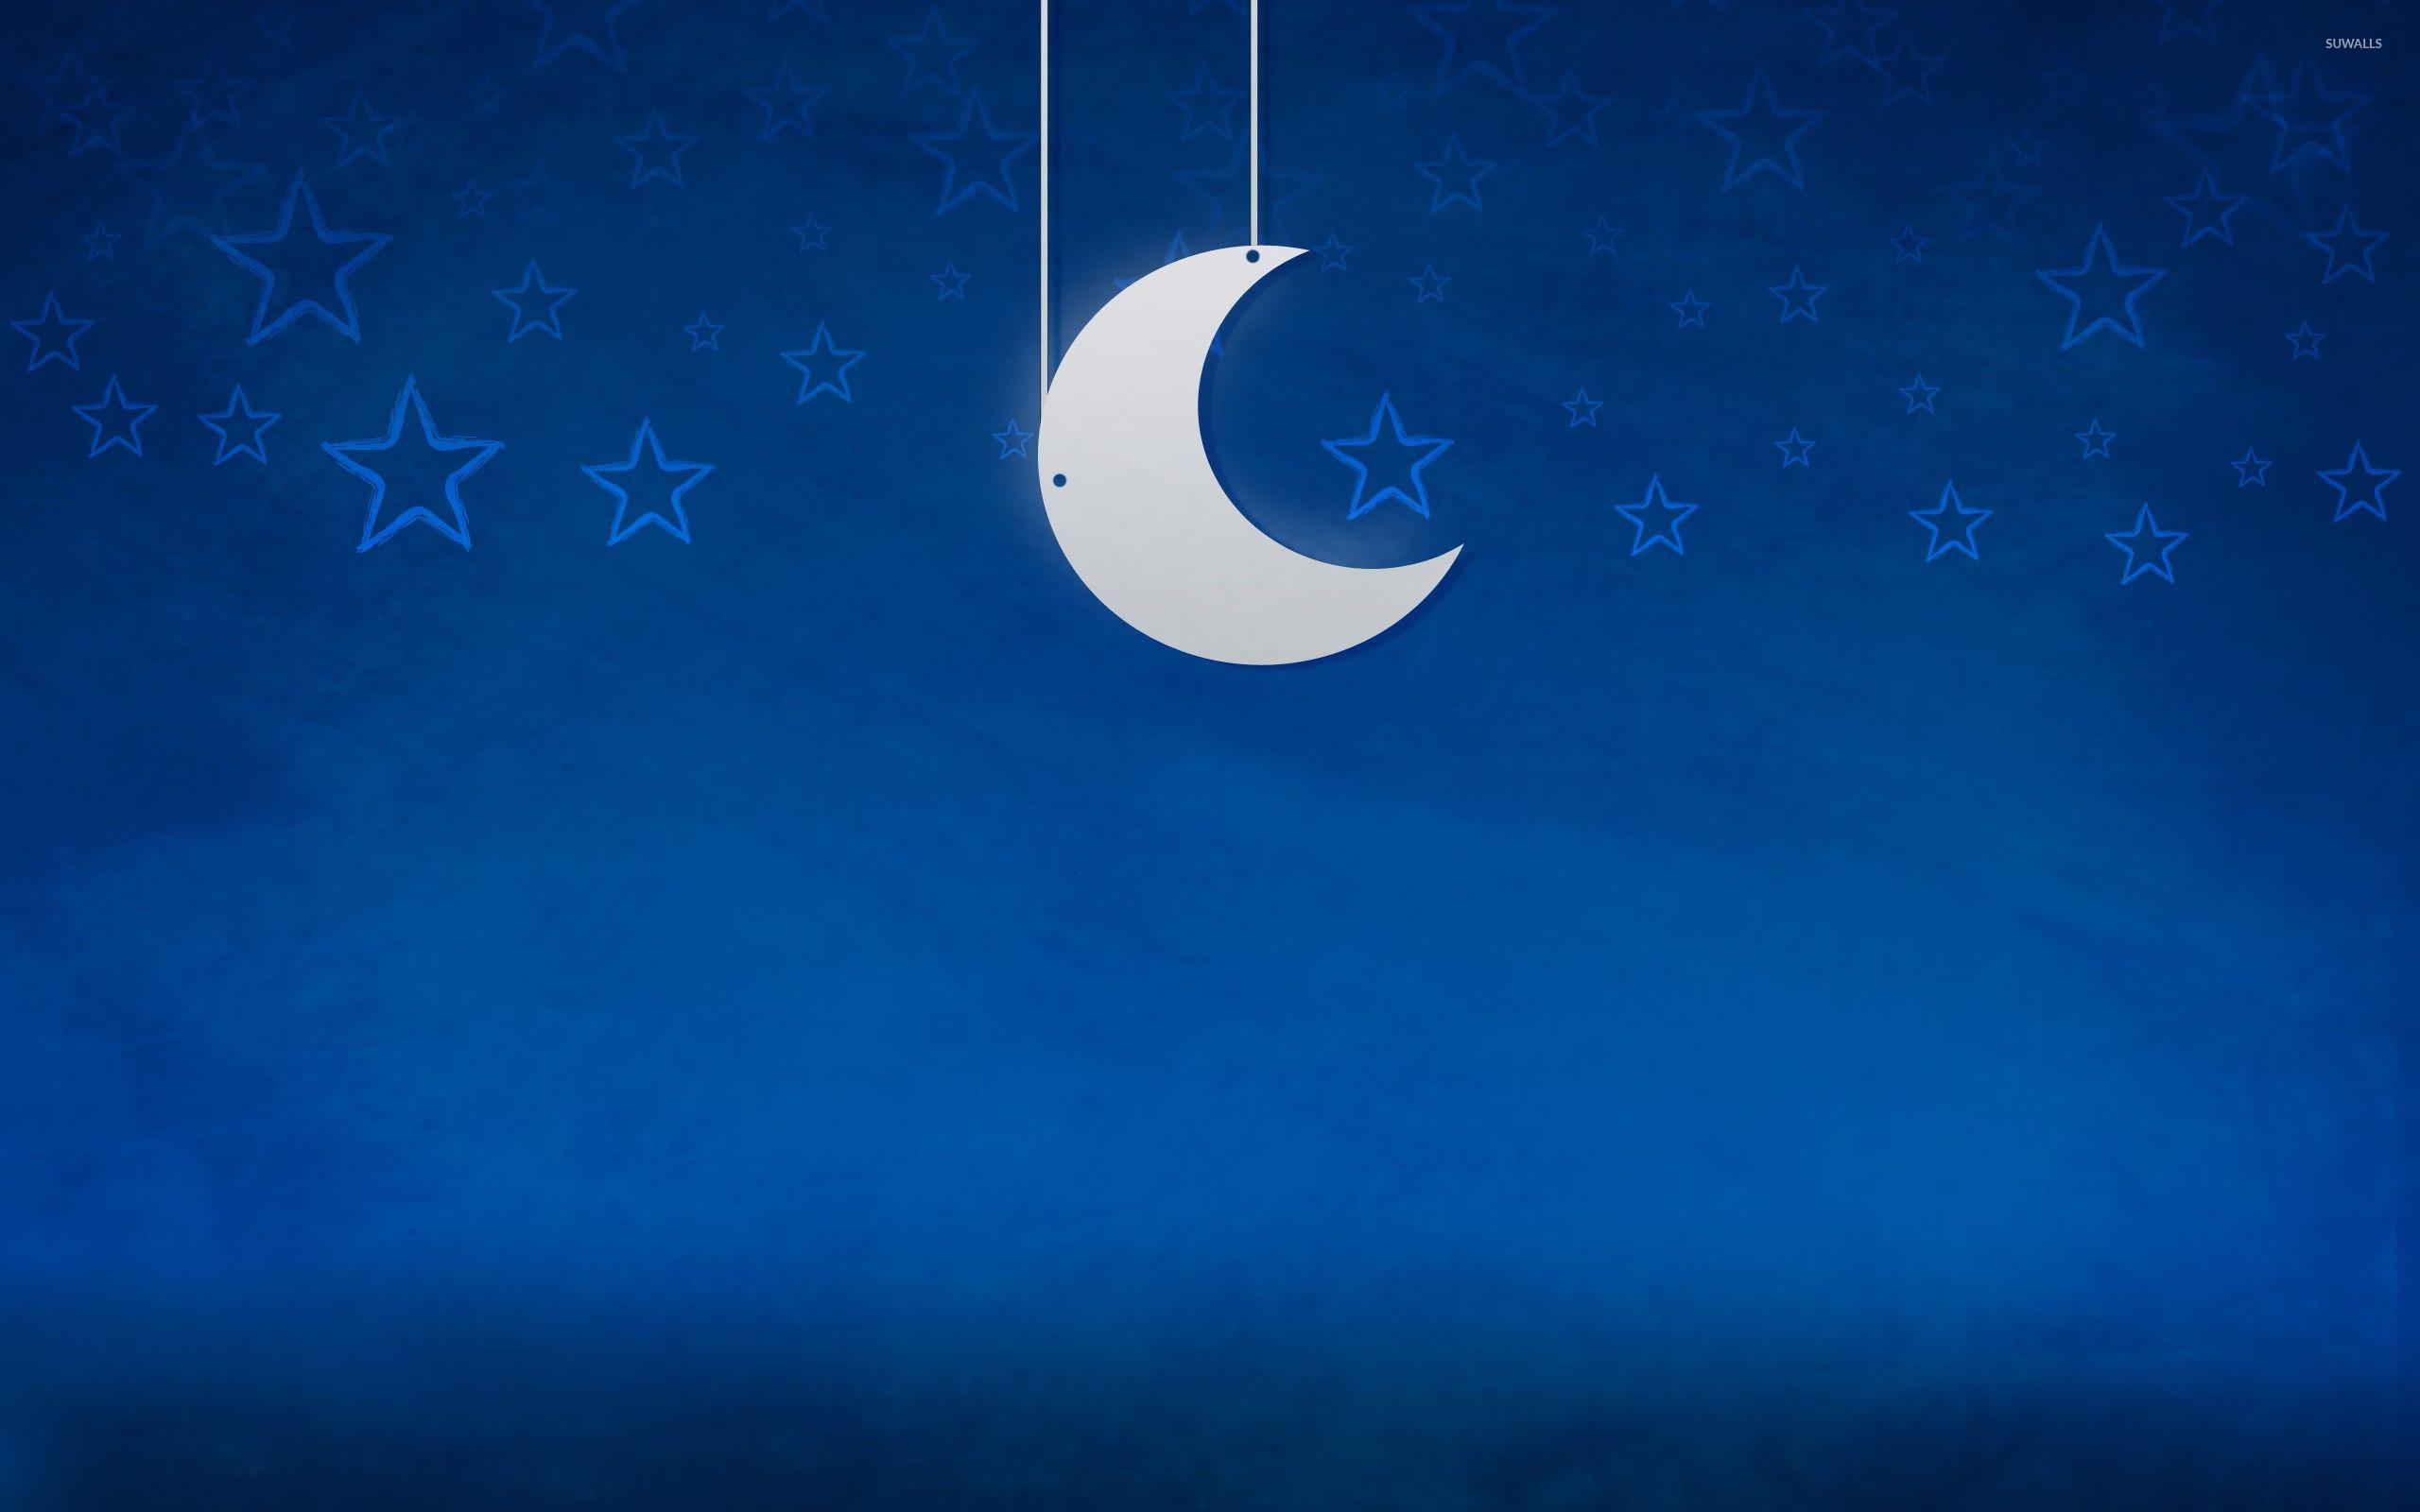 Full Moon And Stars Wallpaper Moon And Stars Wallpaper